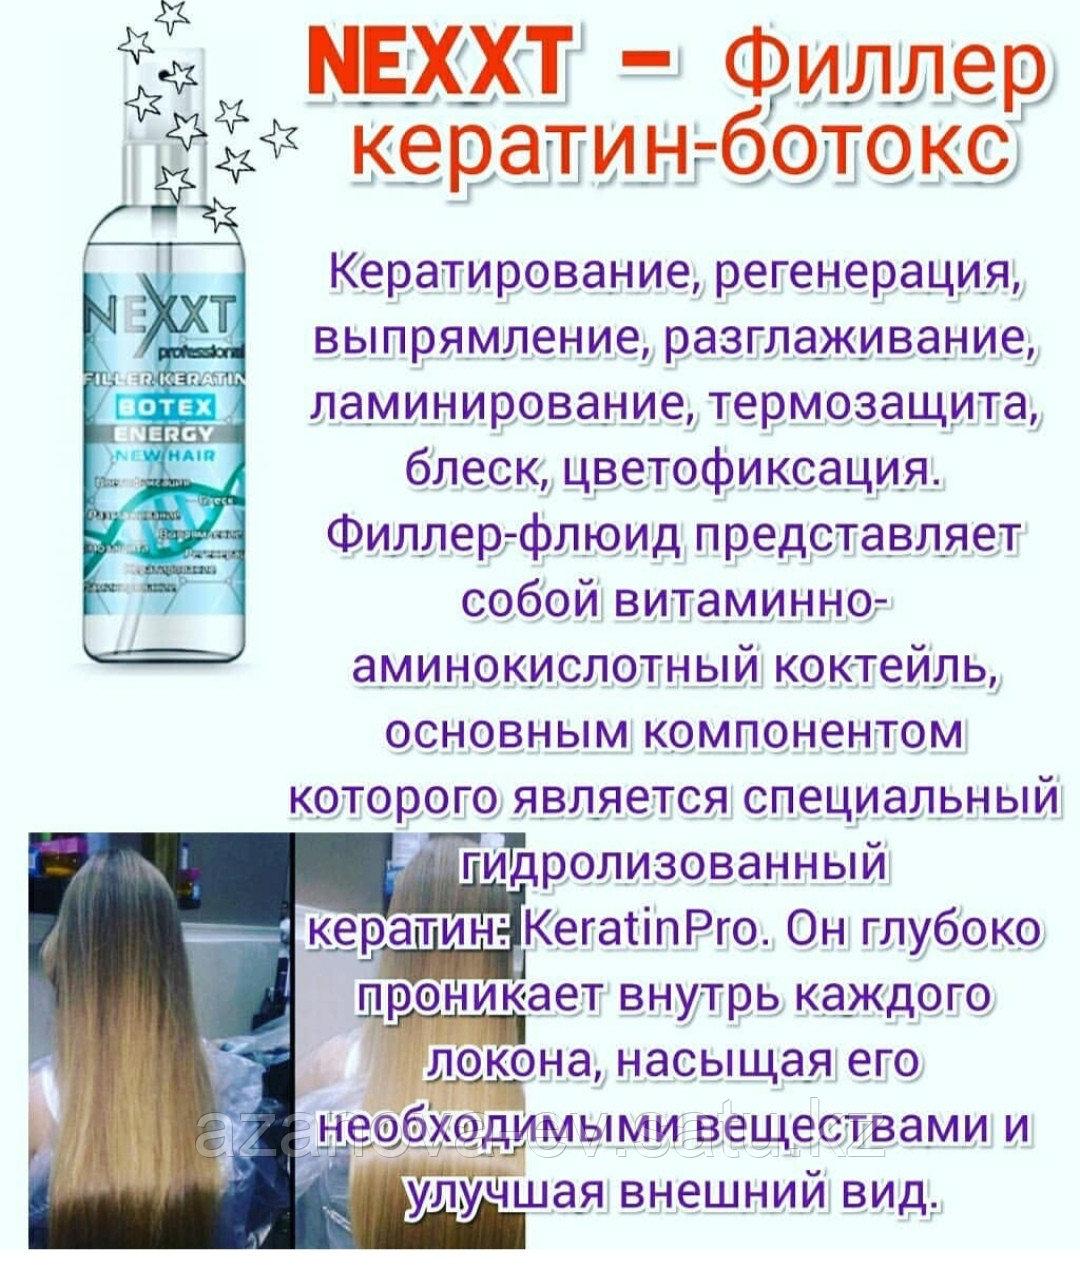 Филлер  кератин - ботекс (ENERGY NEW HAIR) 100 ml